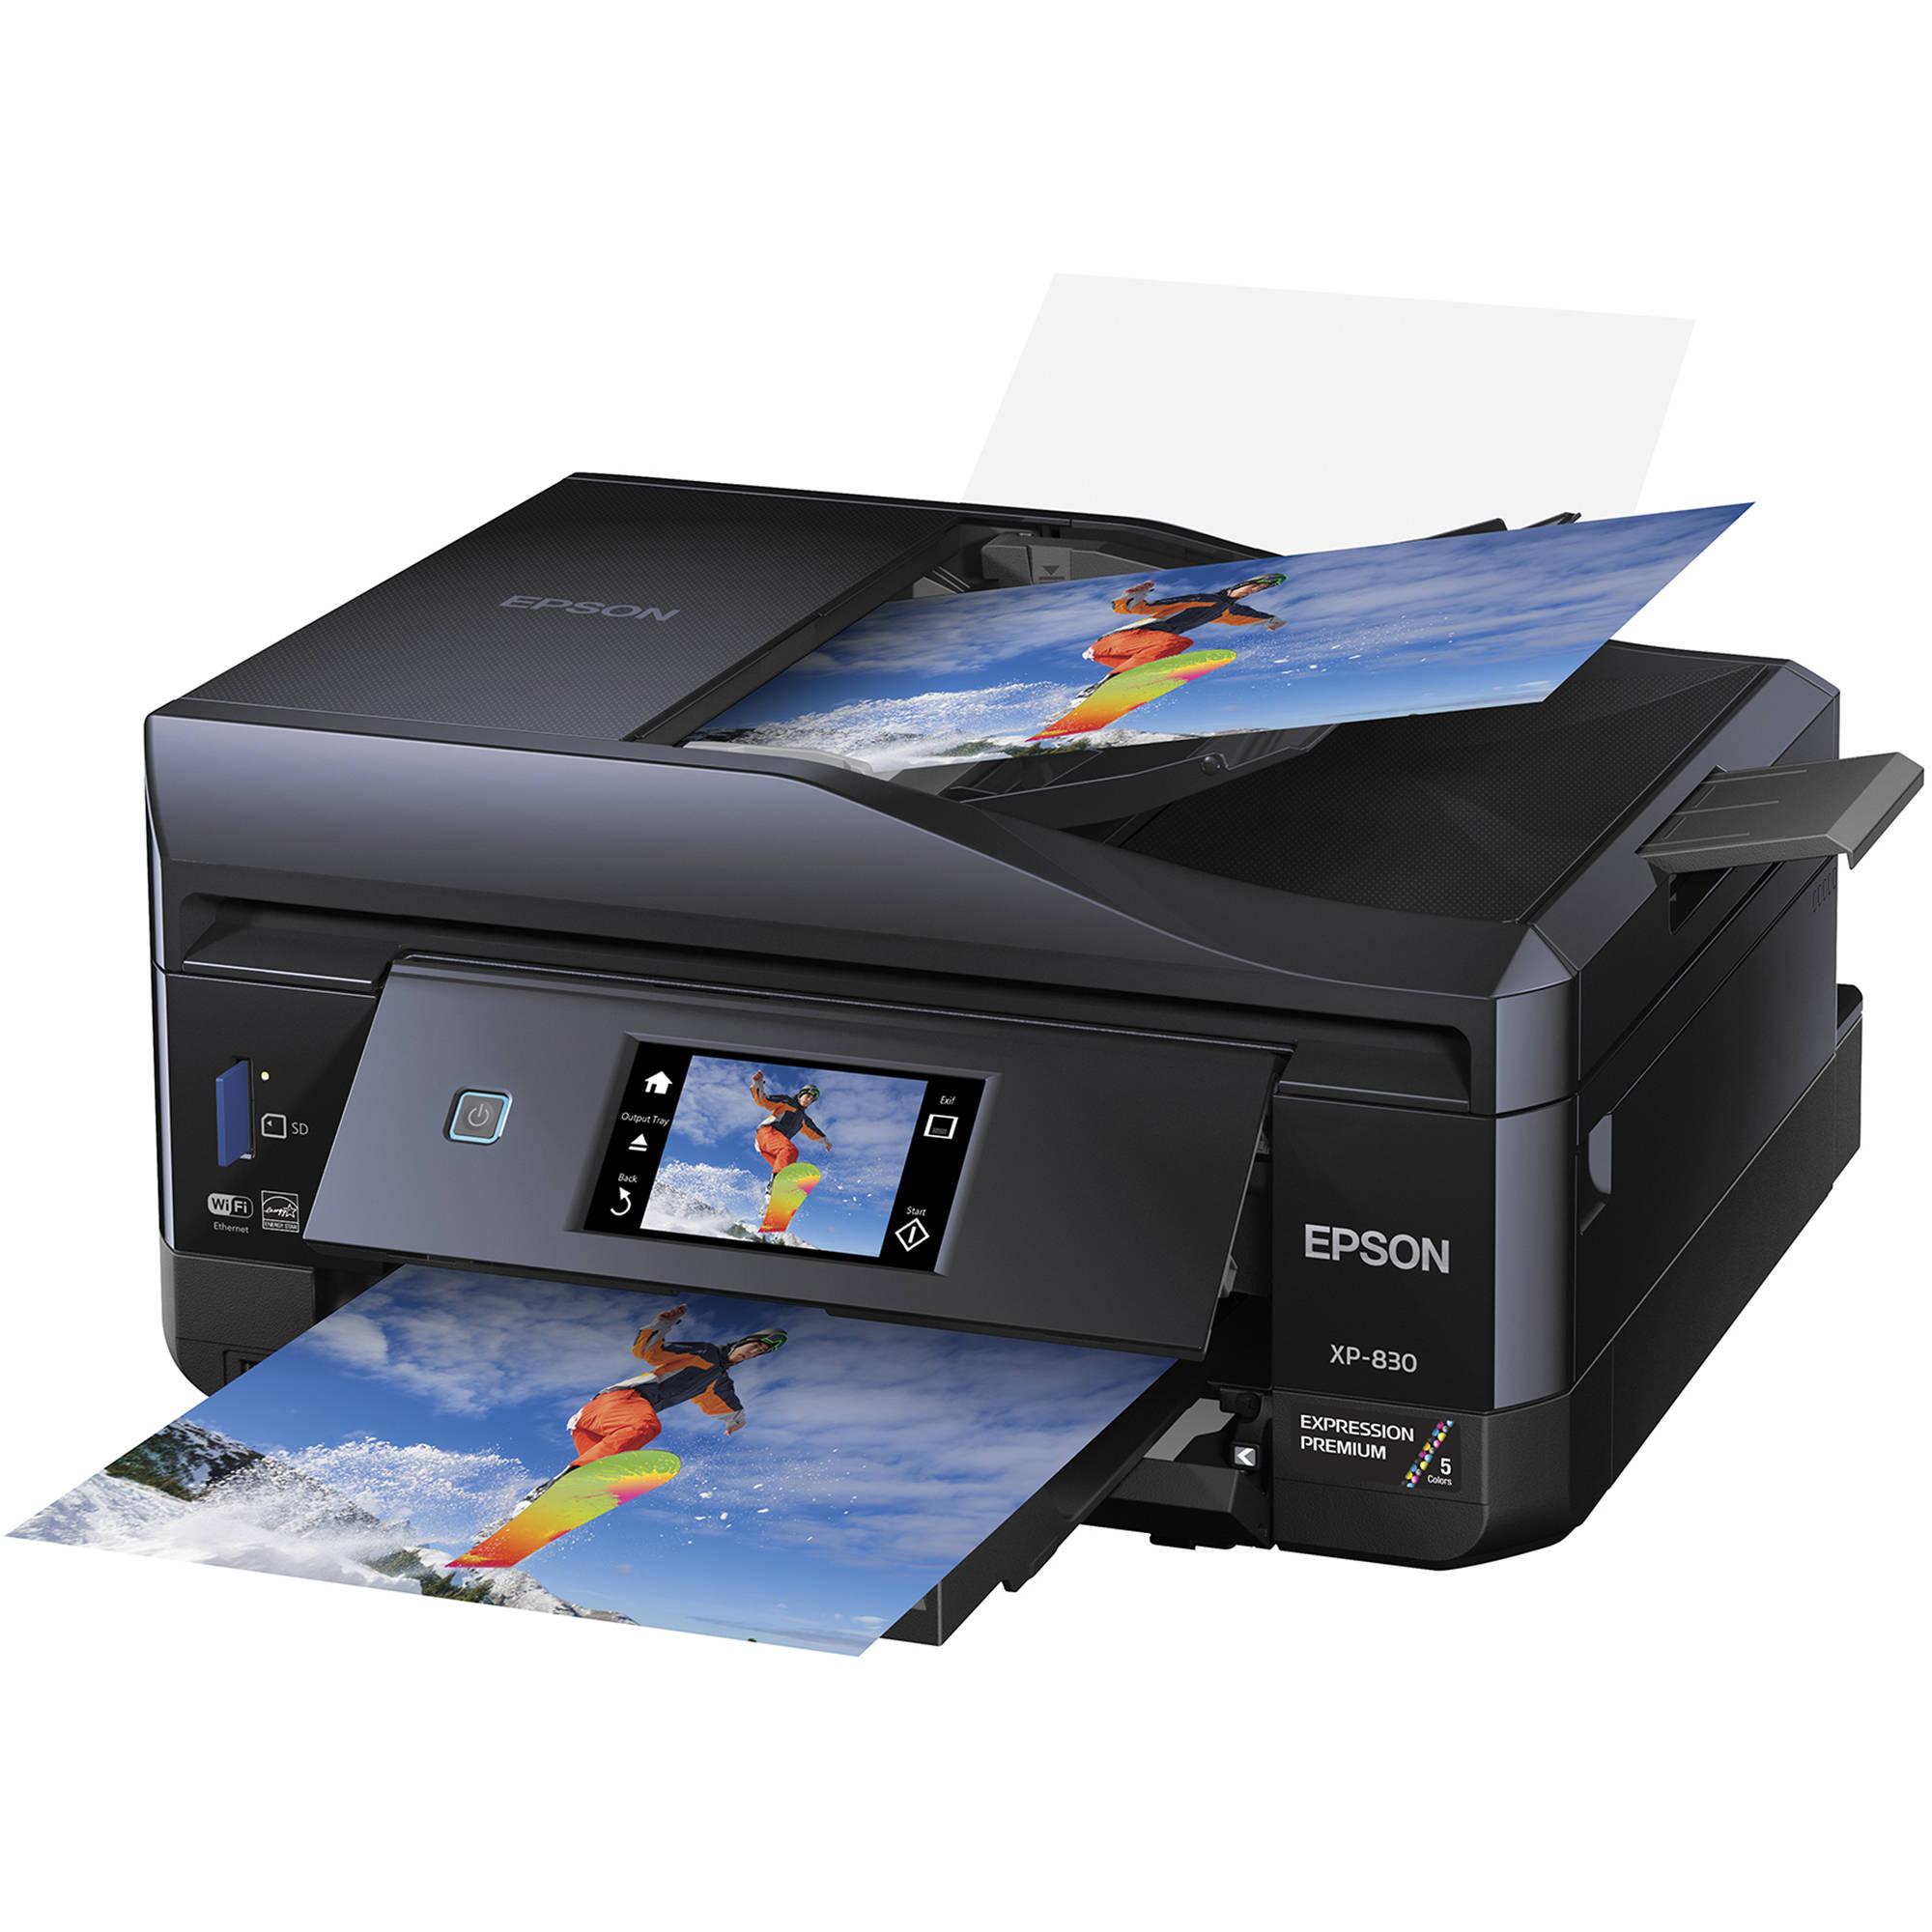 Epson 8 Color Inkjet Print Epson Premium Semigloss Photo: Epson Expression Premium XP-830 Small-In-One Inkjet C11CE78201